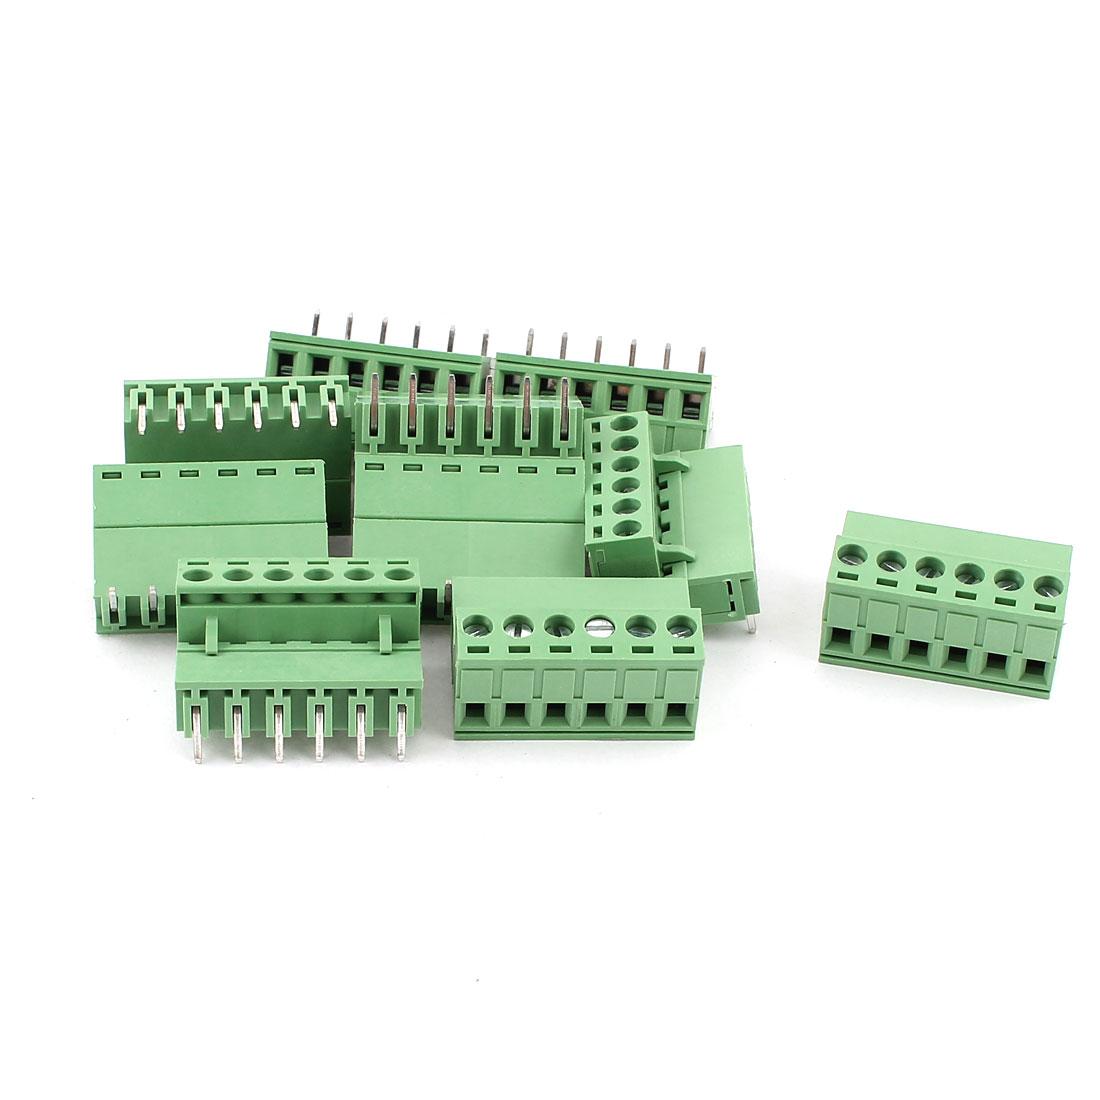 10 Pcs AC 300V 10A 6 Pins PCB Screw Terminal Block Connector 5.08mm Pitch Green